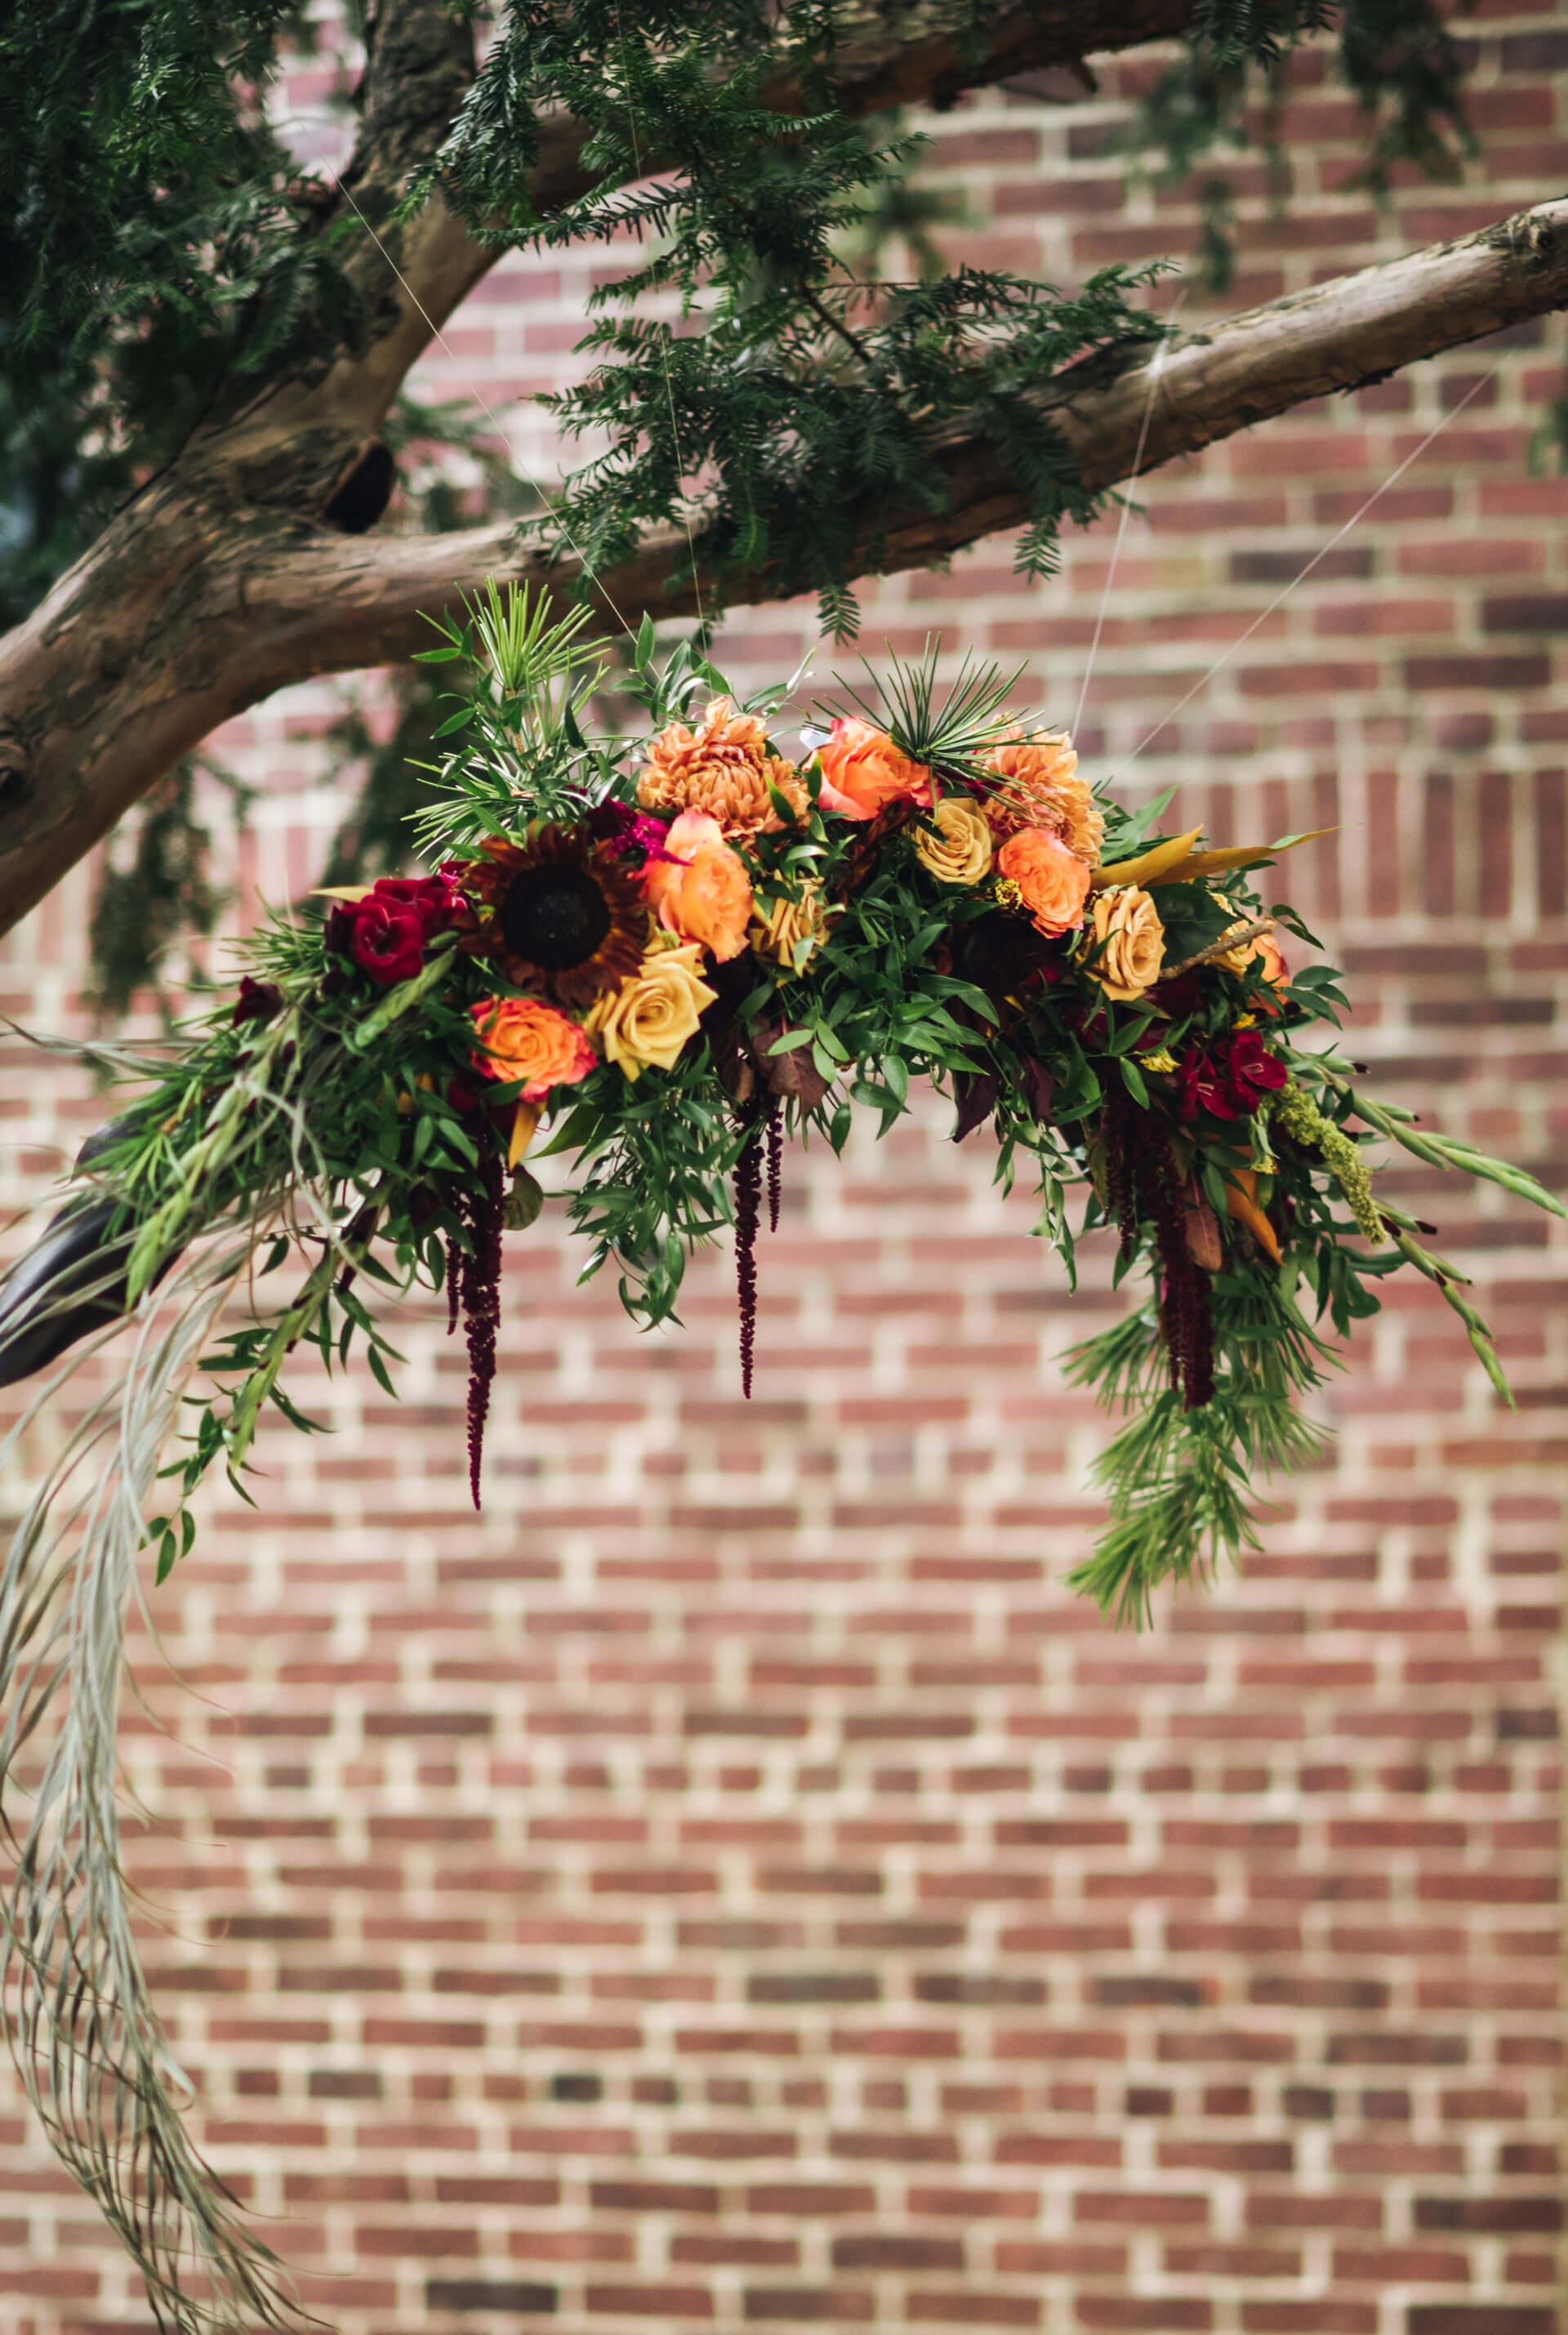 BROOKLYN SOCIETY FOR ETHICAL CULTURE - INTIMATE WEDDING - CHI-CHI ARI-184.jpg